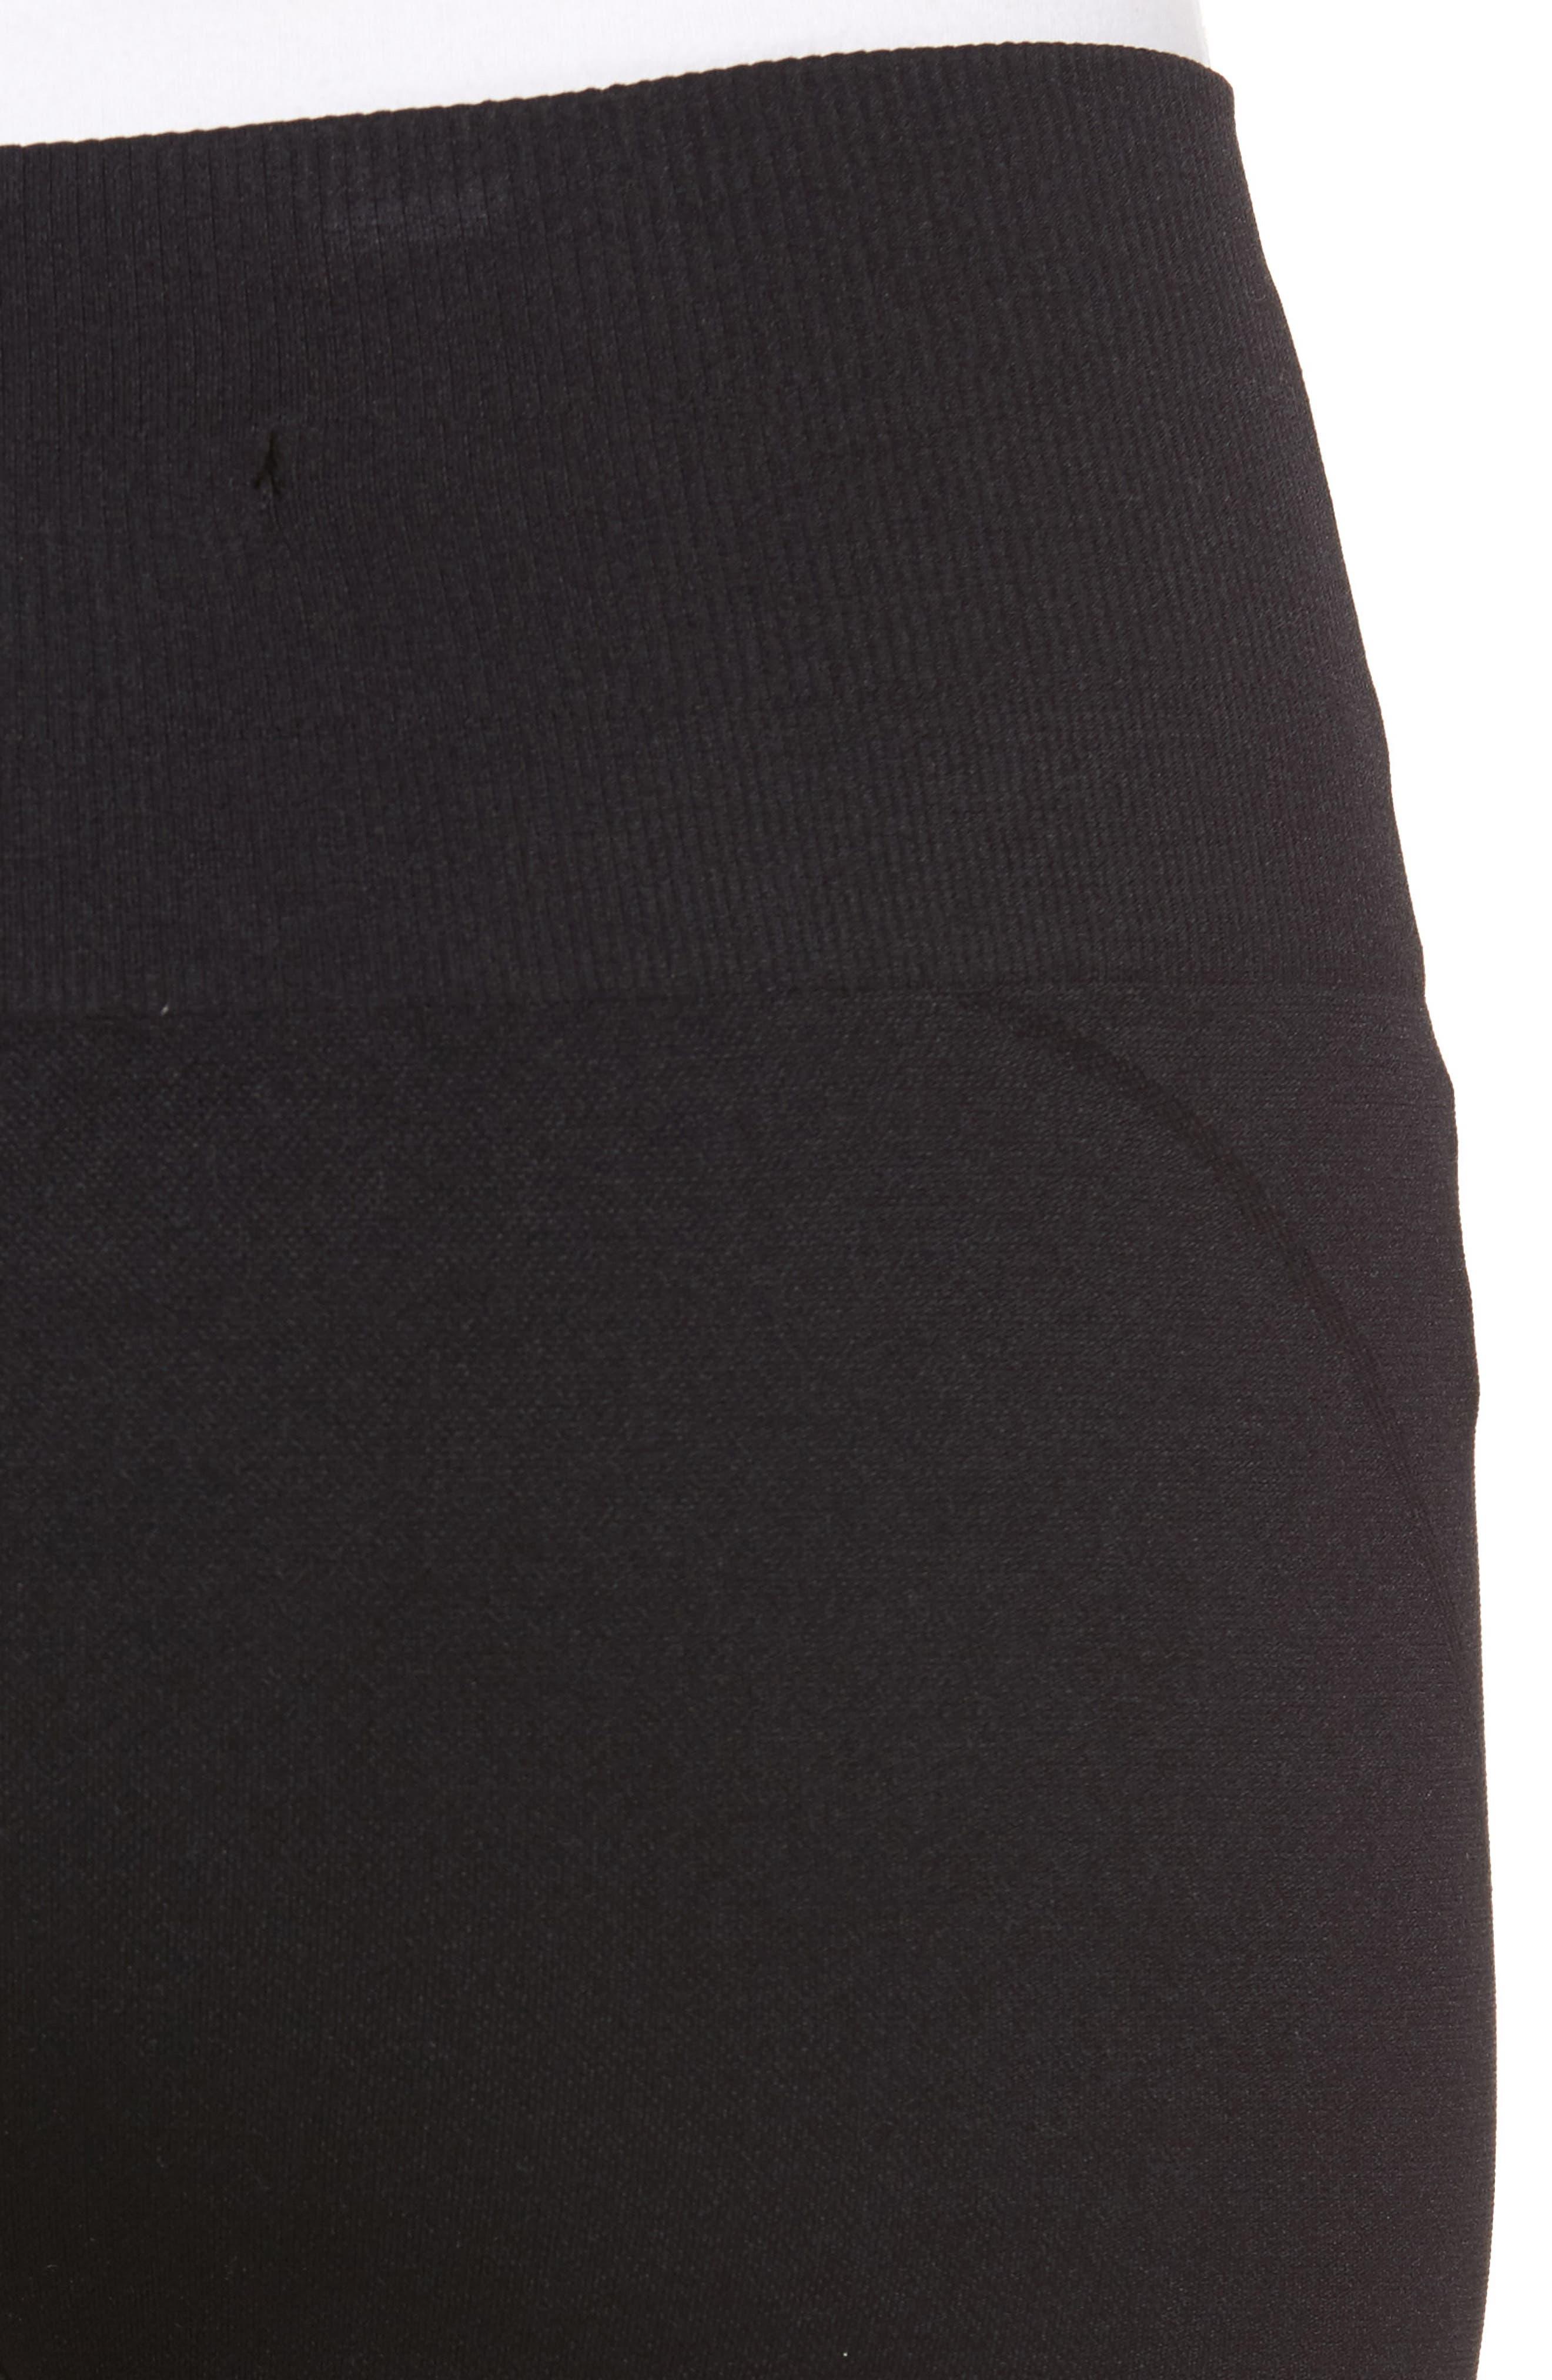 Seamless Leggings,                             Alternate thumbnail 4, color,                             BLACK